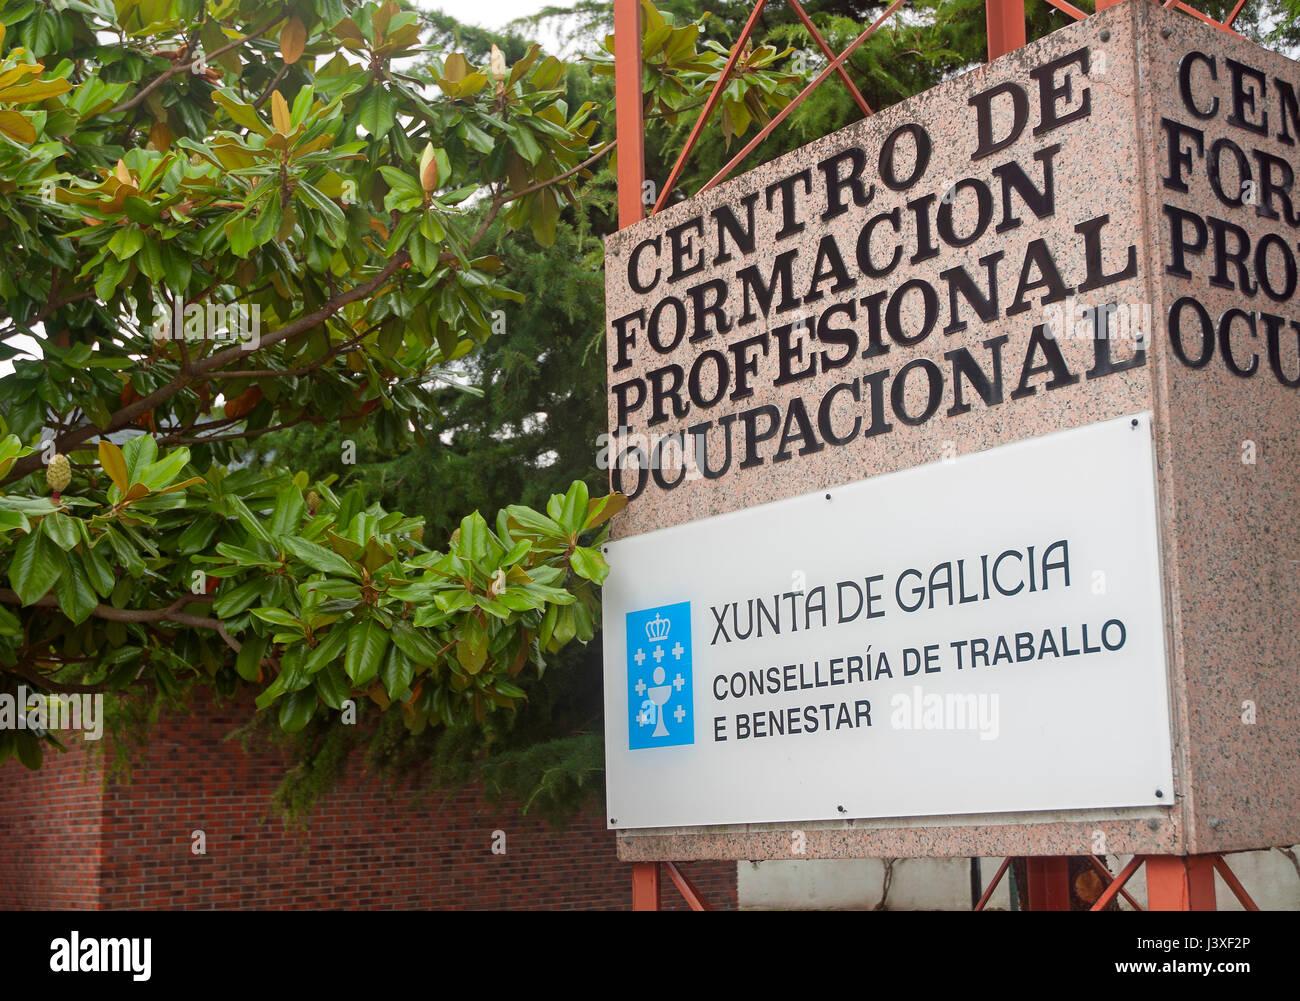 Centro de formación ocupacional, Viveiro, provincia de Lugo, en la región de Galicia, España, Europa Imagen De Stock